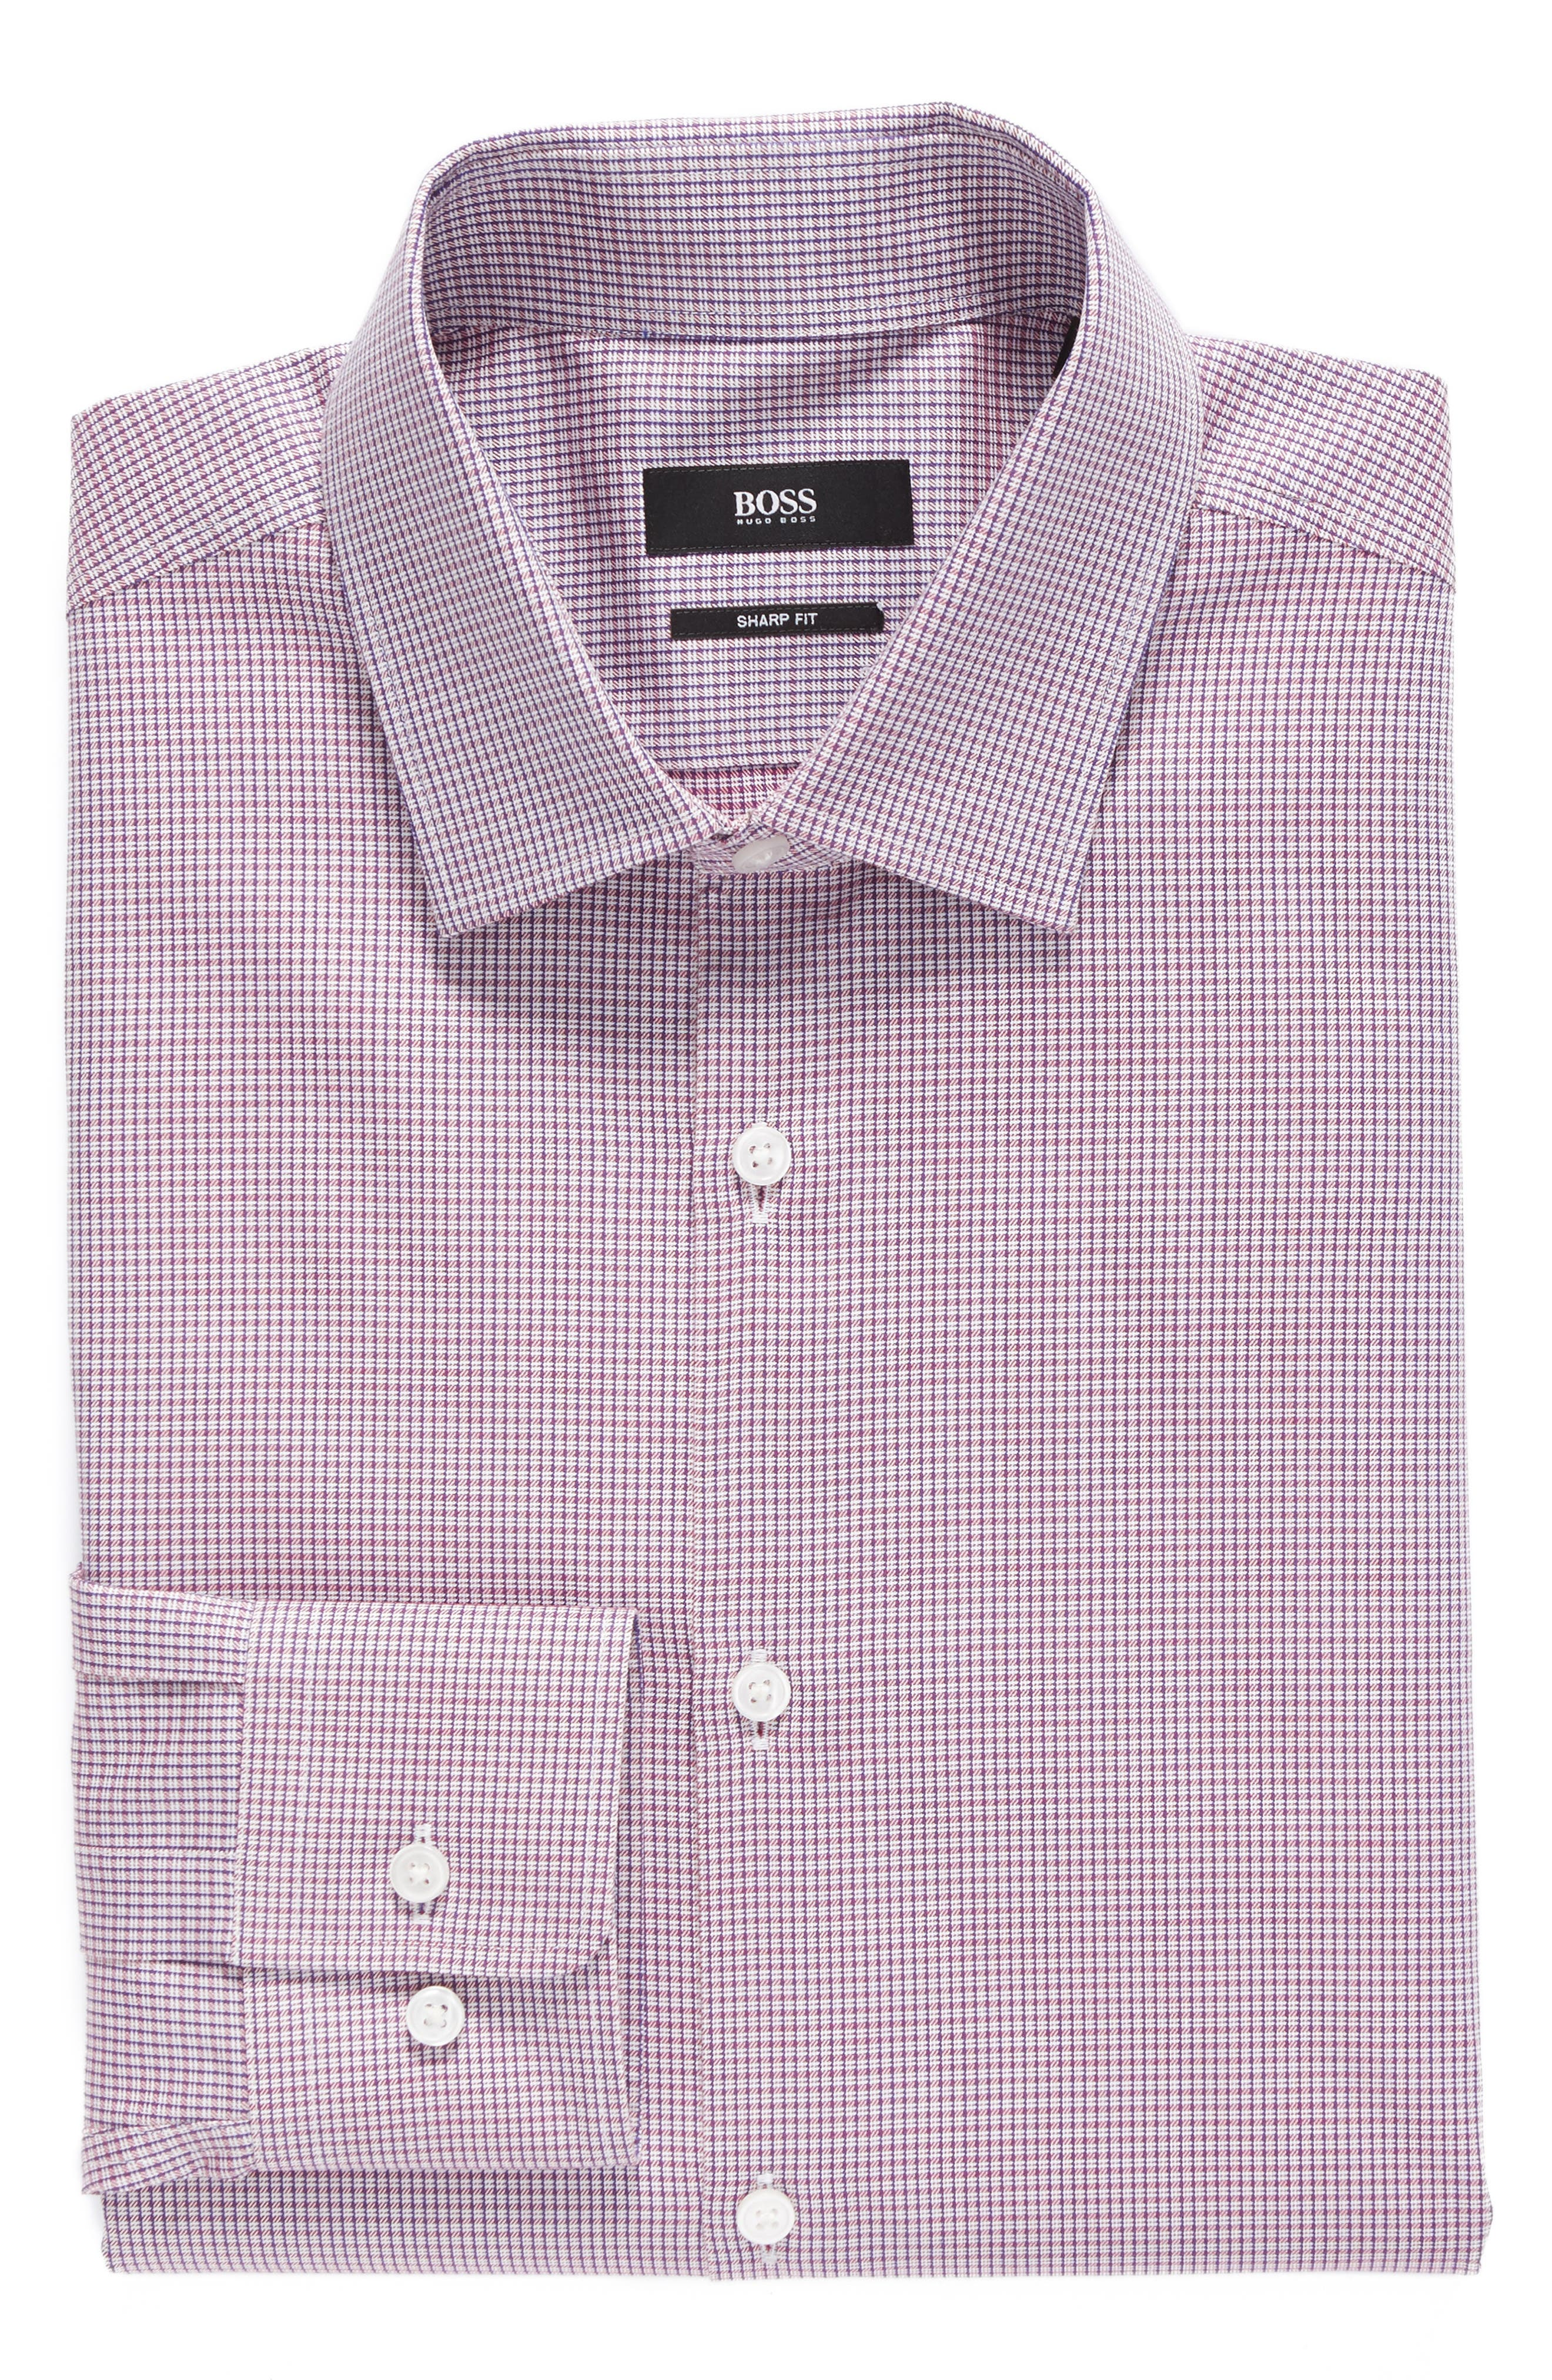 Main Image - BOSS Sharp Fit Check Dress Shirt